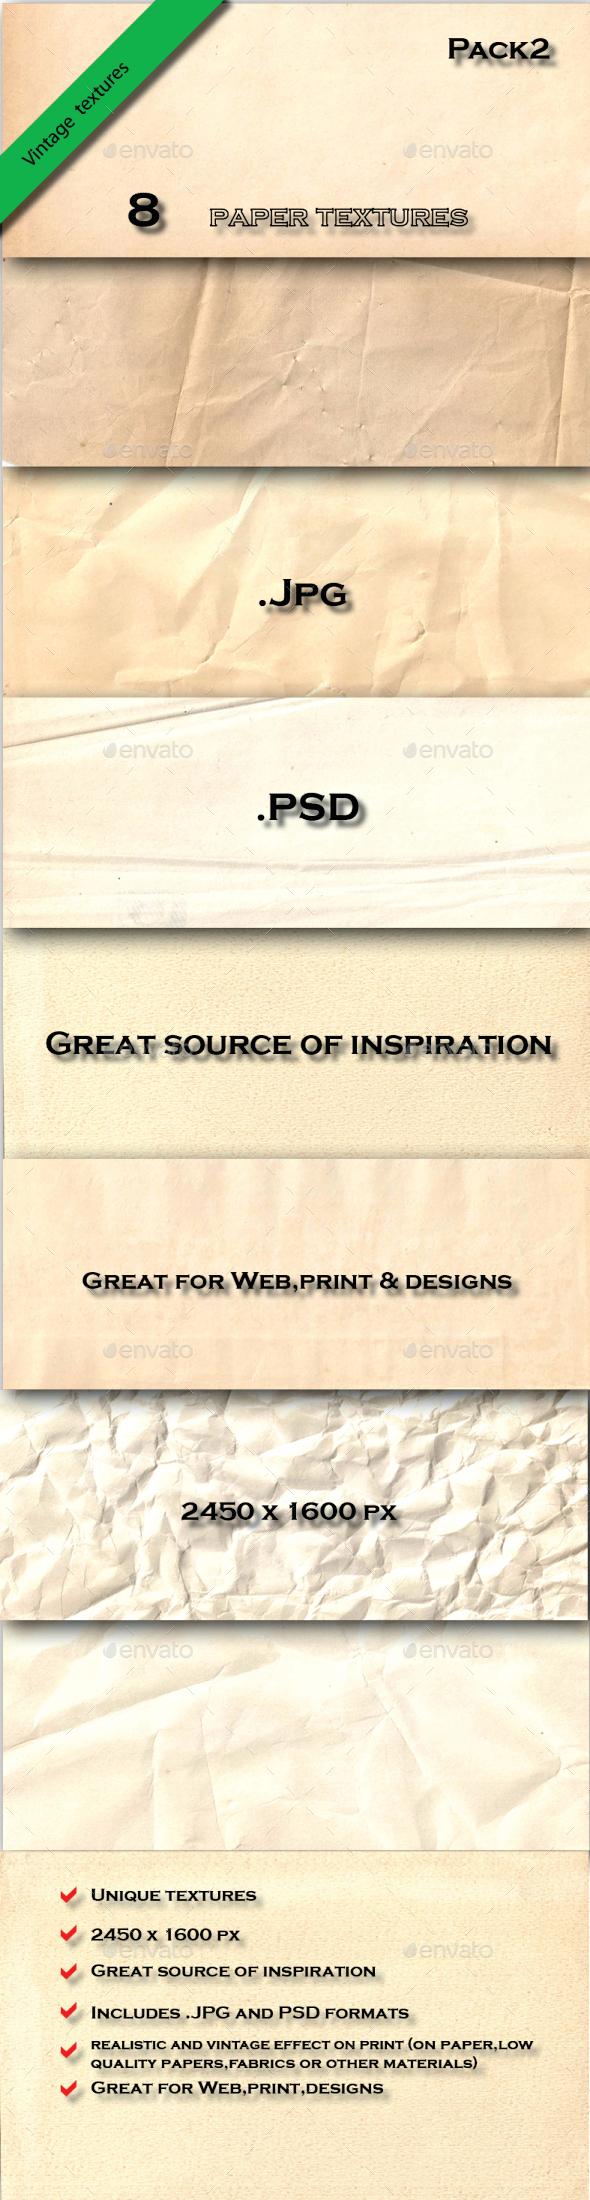 8 Vintage Paper Textures Pack2 - Paper Textures